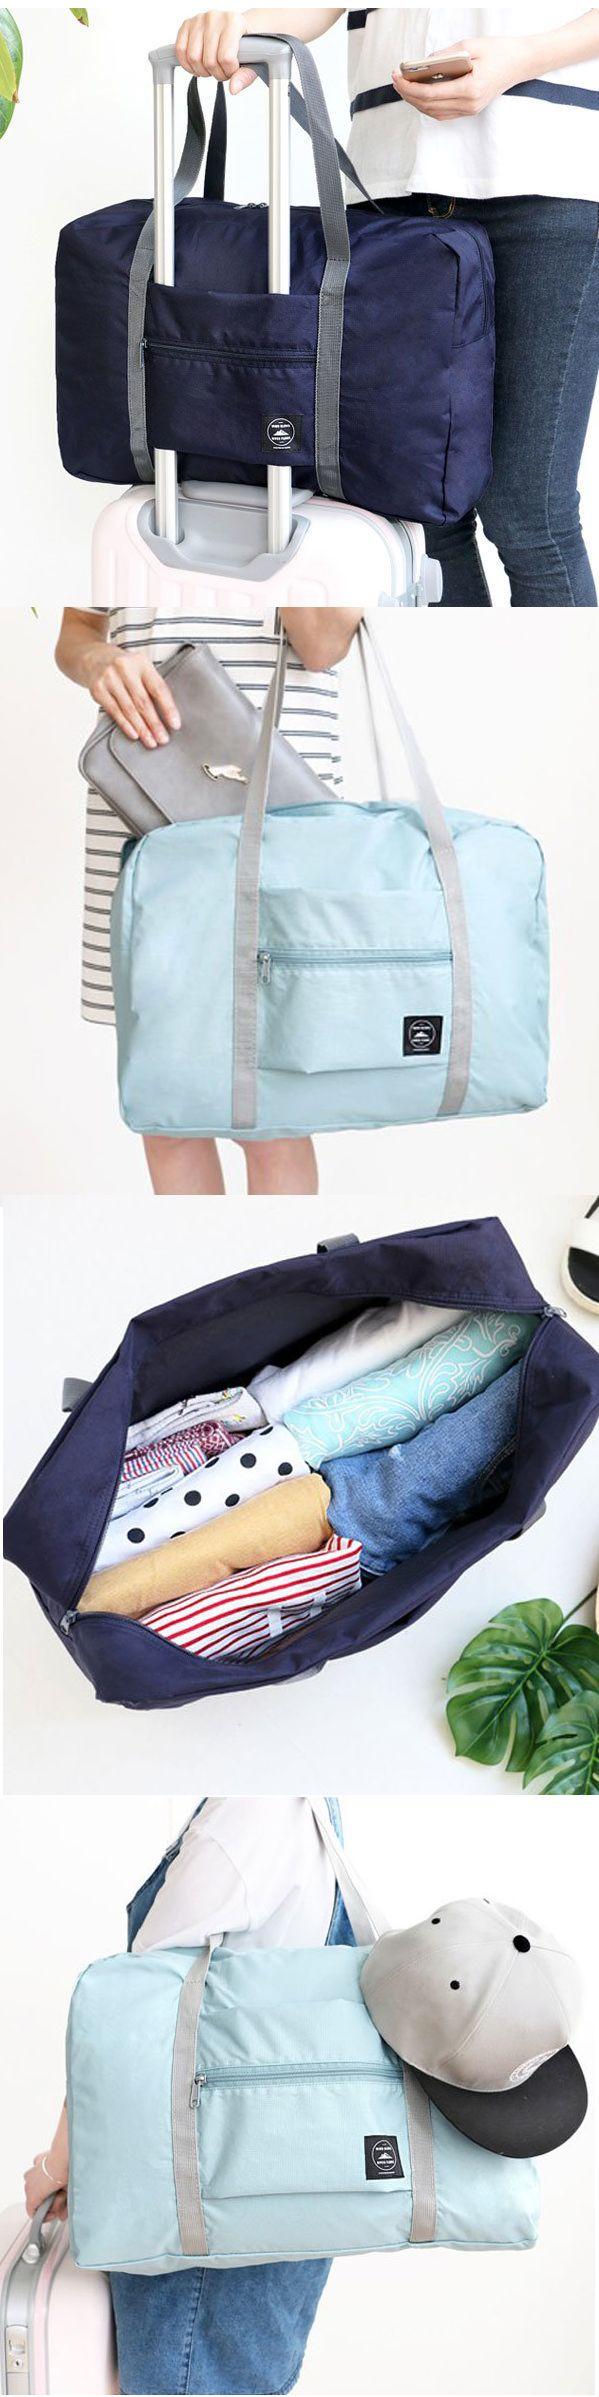 $5.99 Large Travel Bag Waterproof Storage Bag Luggage Folding Handbag Shoulder Bag Storage Containers